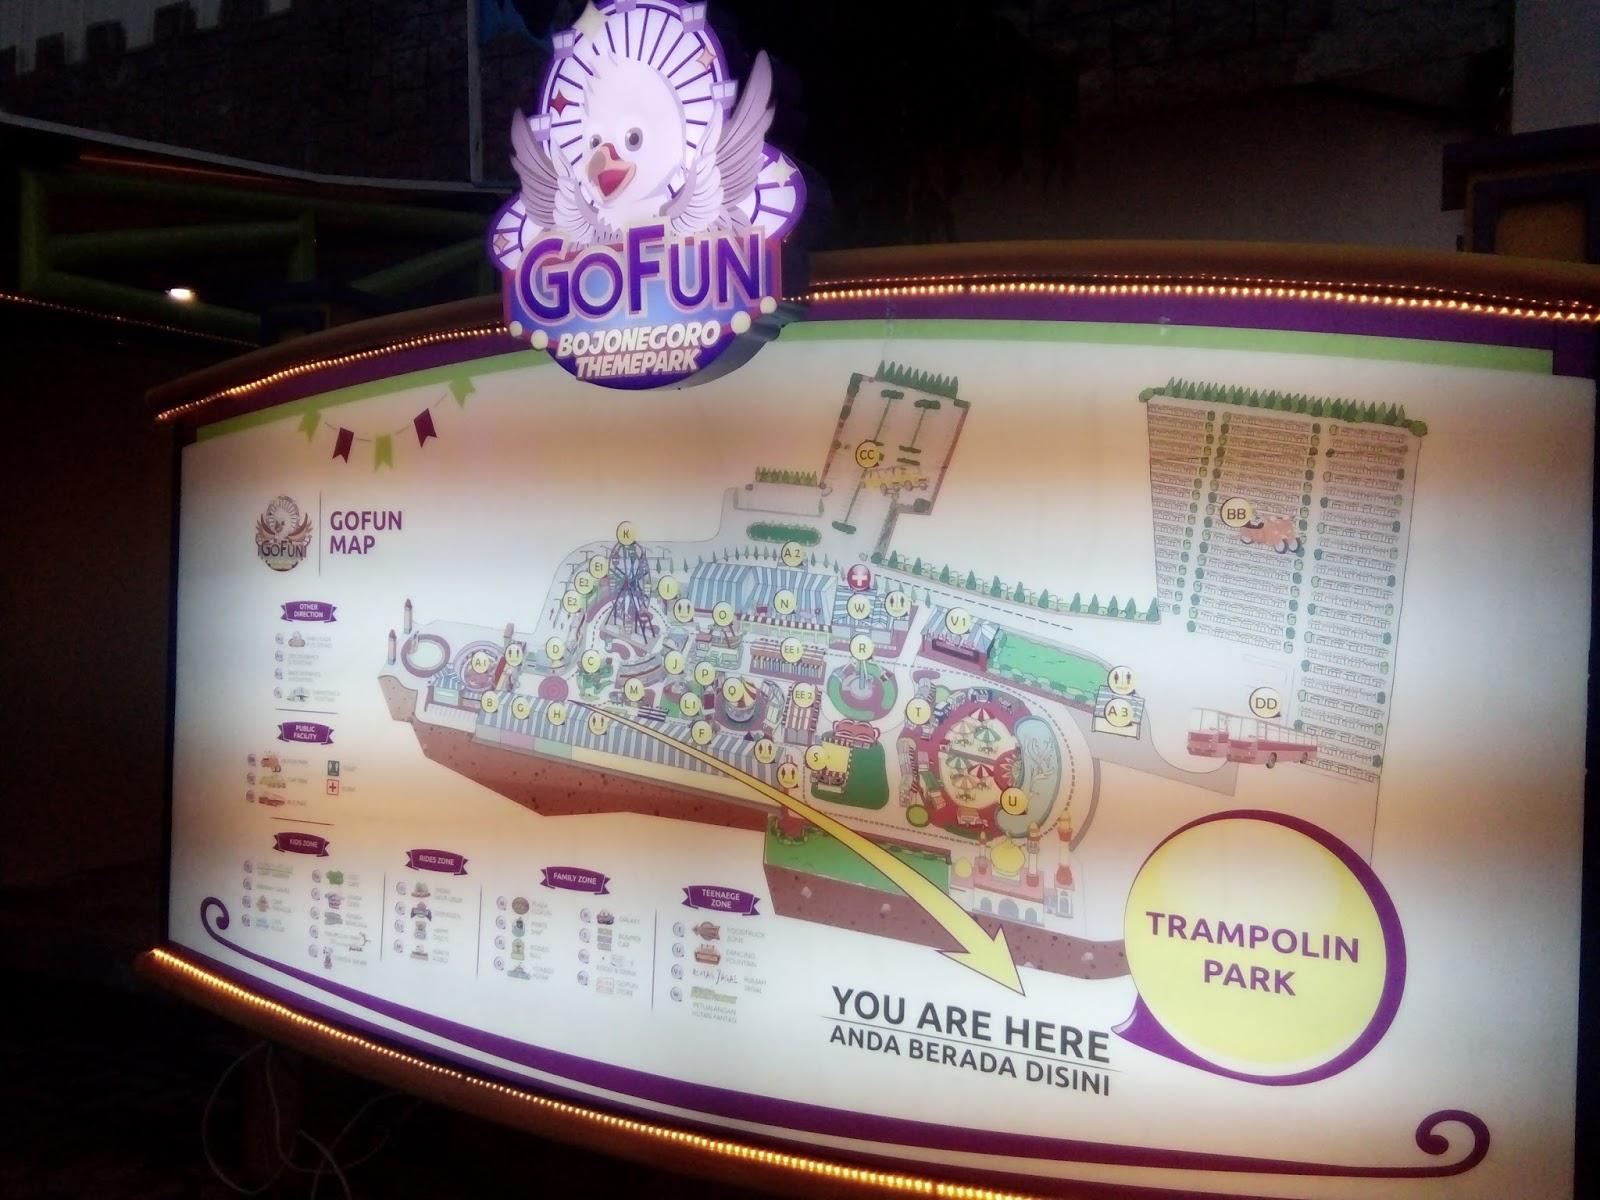 Jalan Gofun Bojonegoro Theme Park Destinasi Wisata Wahana Sitemap Fun